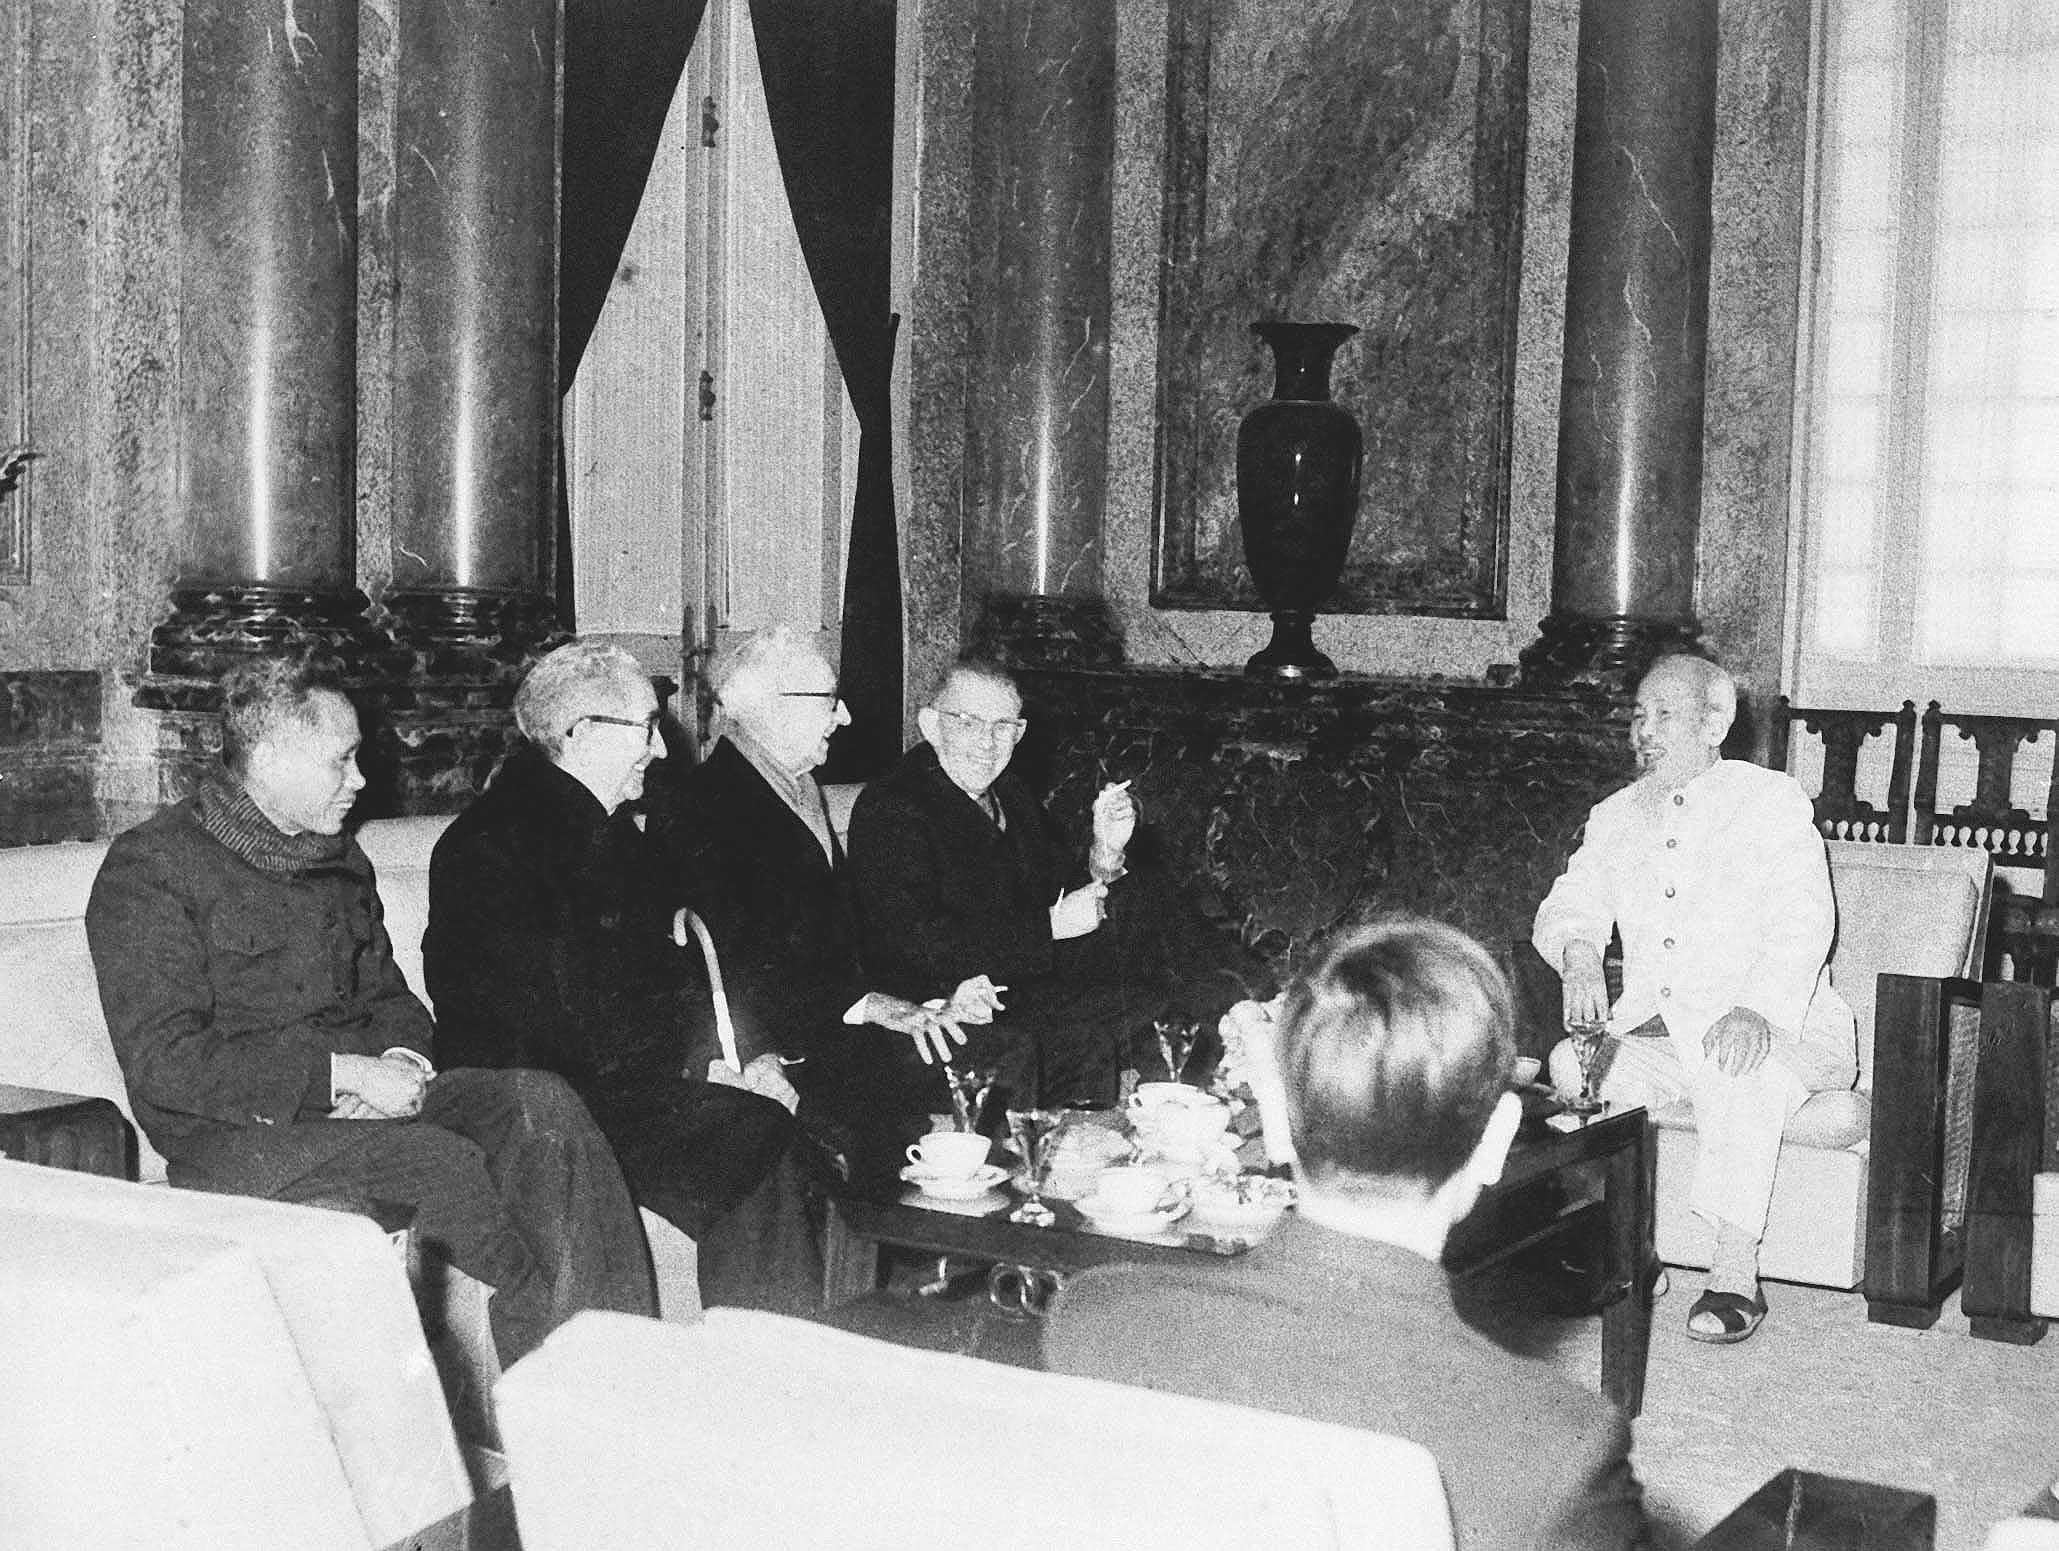 L'ere Ho Chi Minh - epoque la plus brillante de l'histoire de la nation vietnamienne hinh anh 19